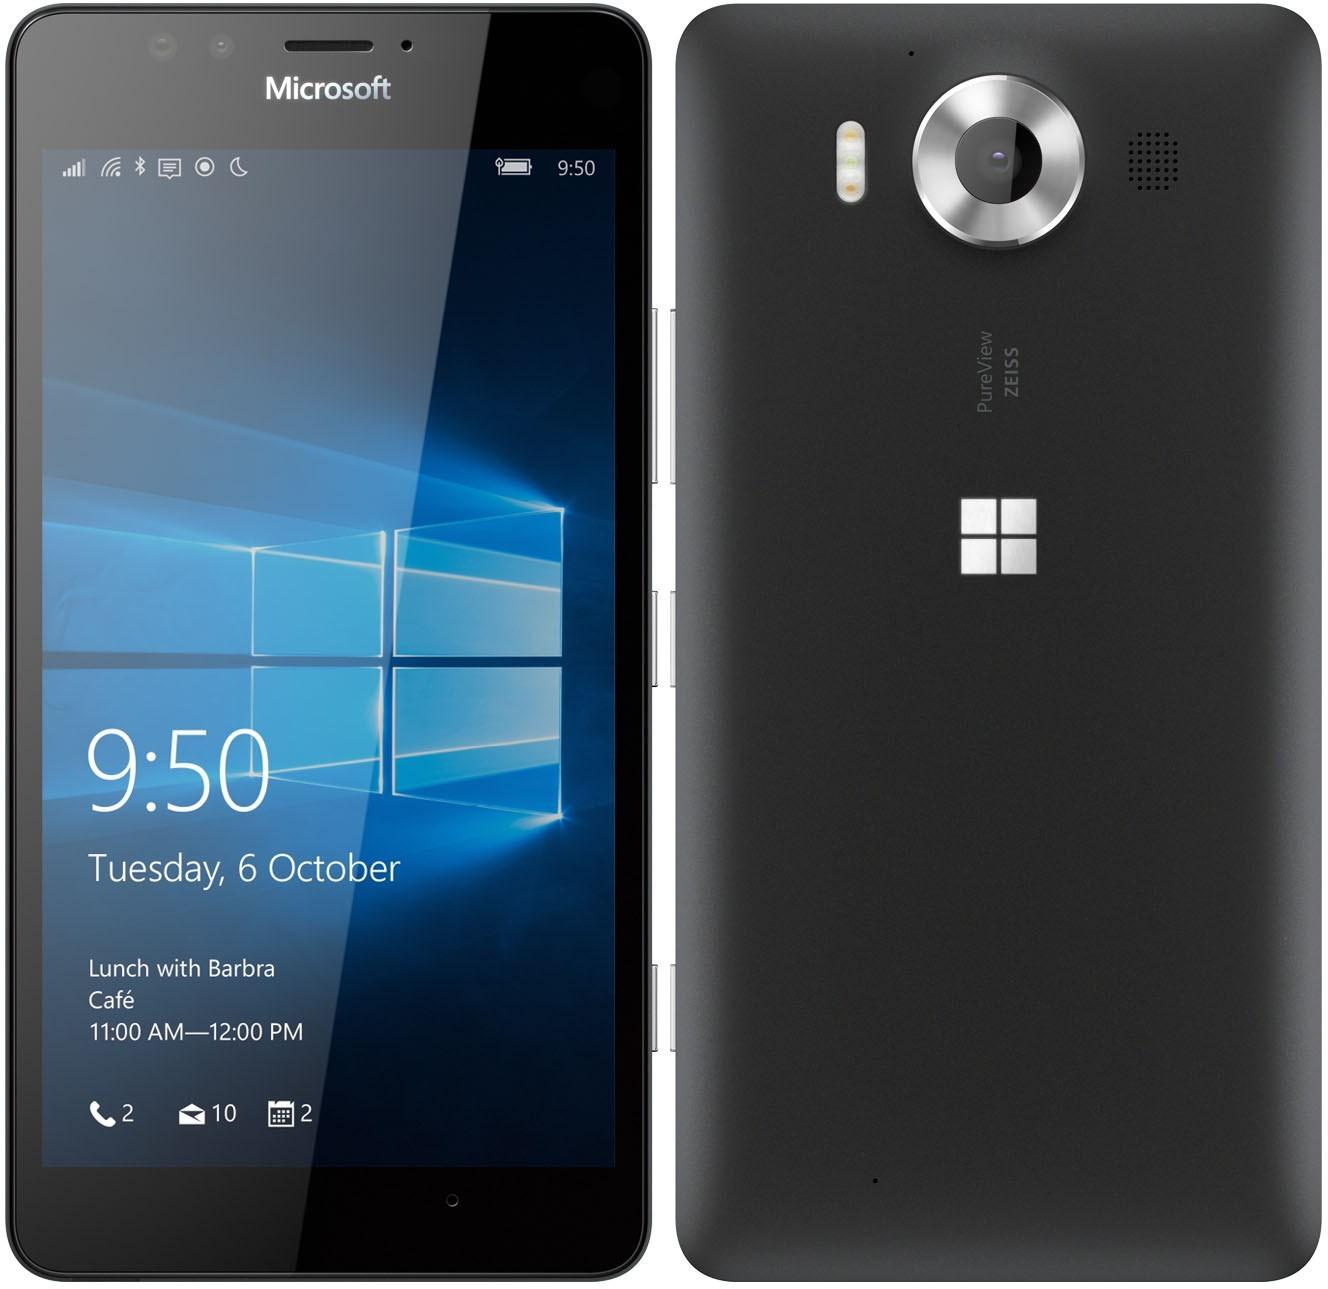 "Microsoft lumia 950 3gb 32gb black 5.2"" hd screen windows 10 4g lte smartphone"